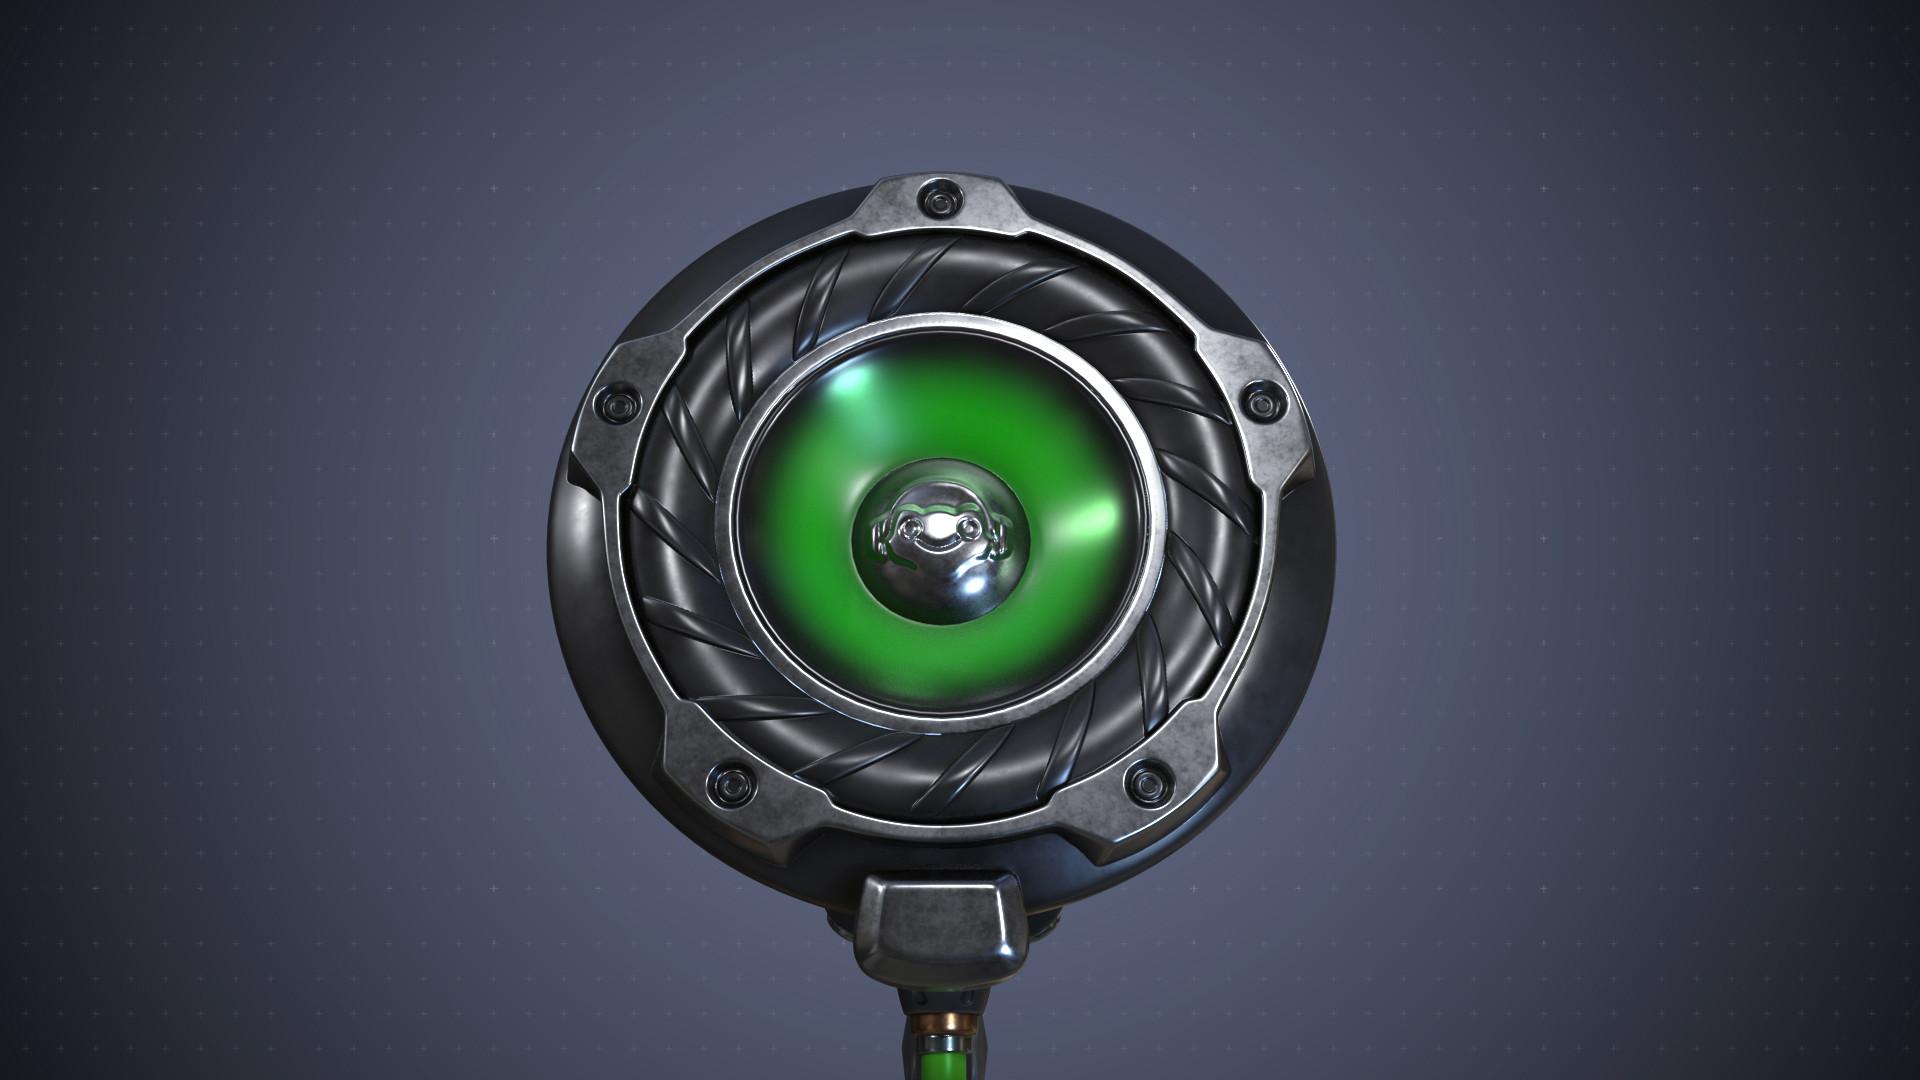 Rakan khamash weapon an final 3